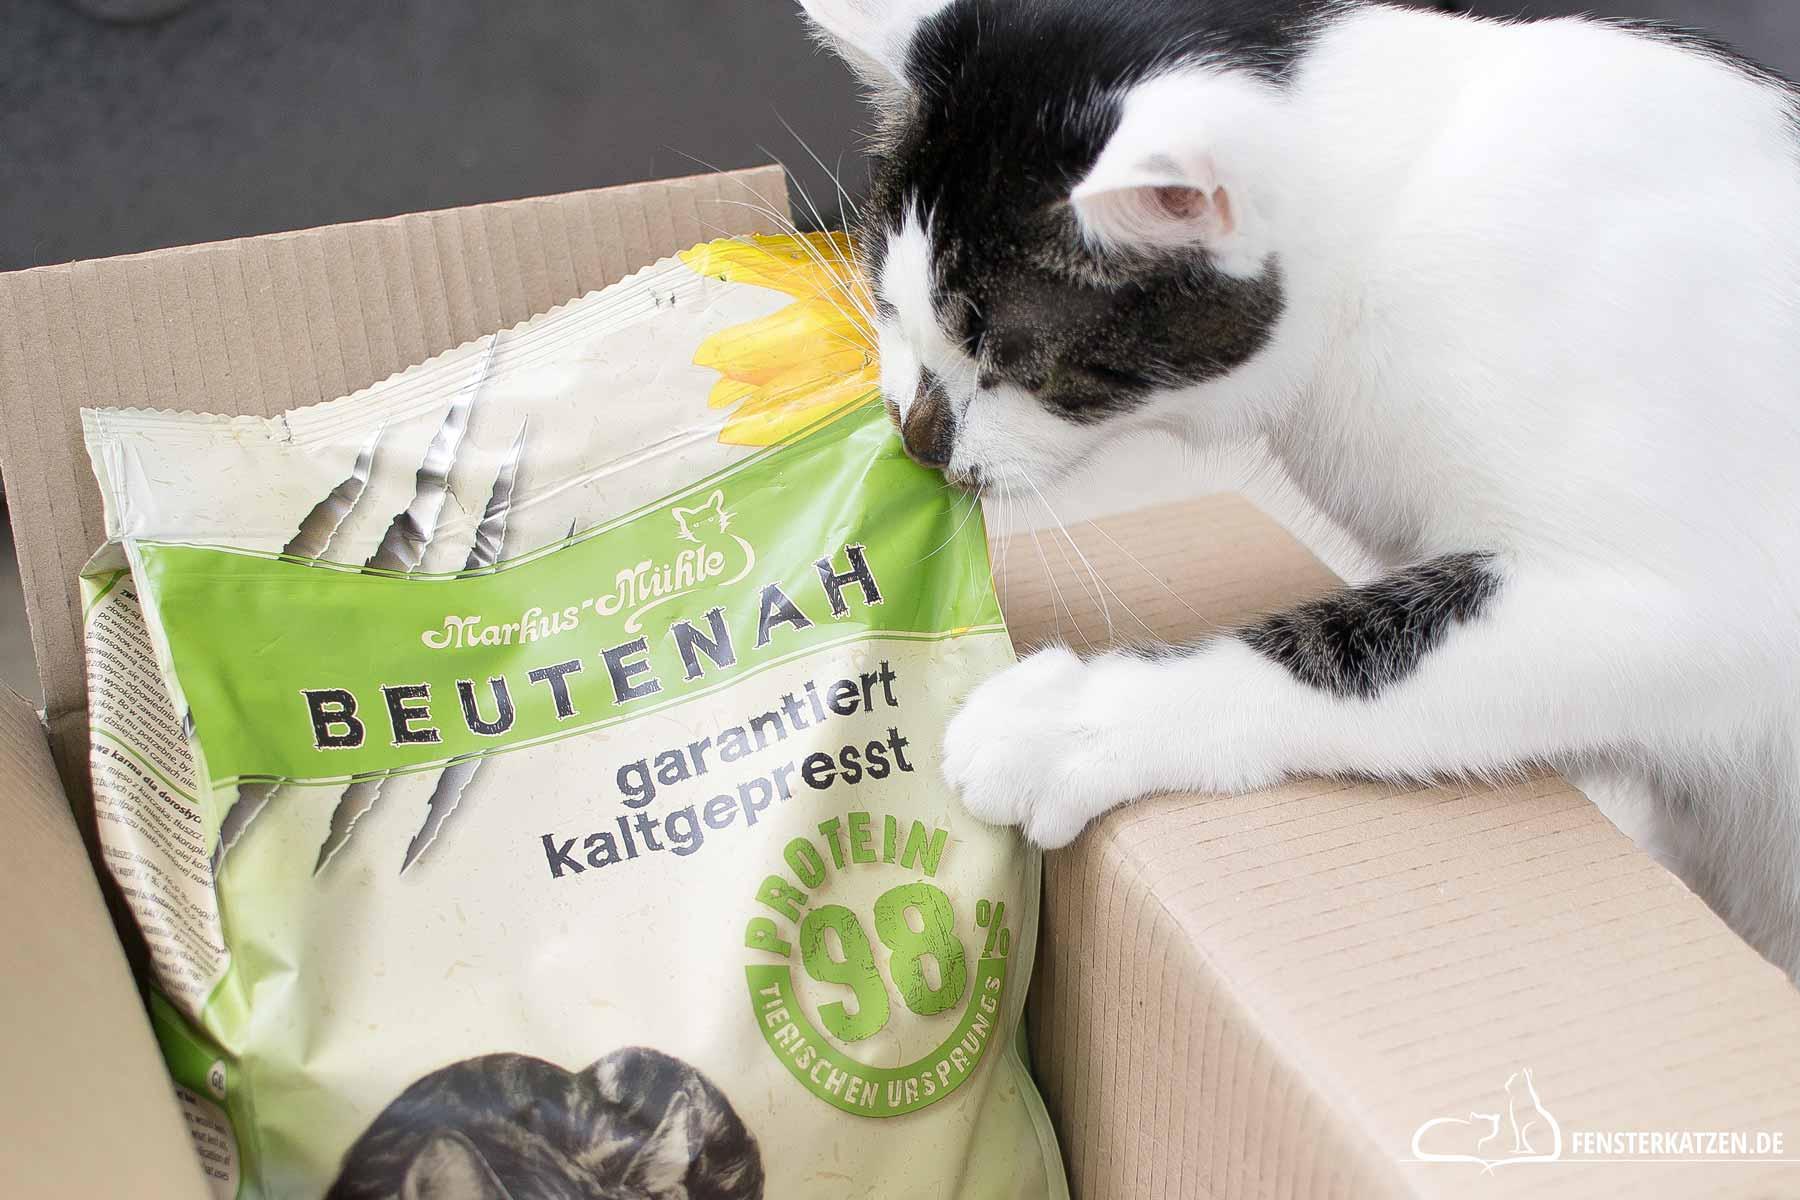 Fensterkatzen-Getestet-Katzenfutter-Beutenah-Trockenfutter-Markus-Muehle-Titelbild